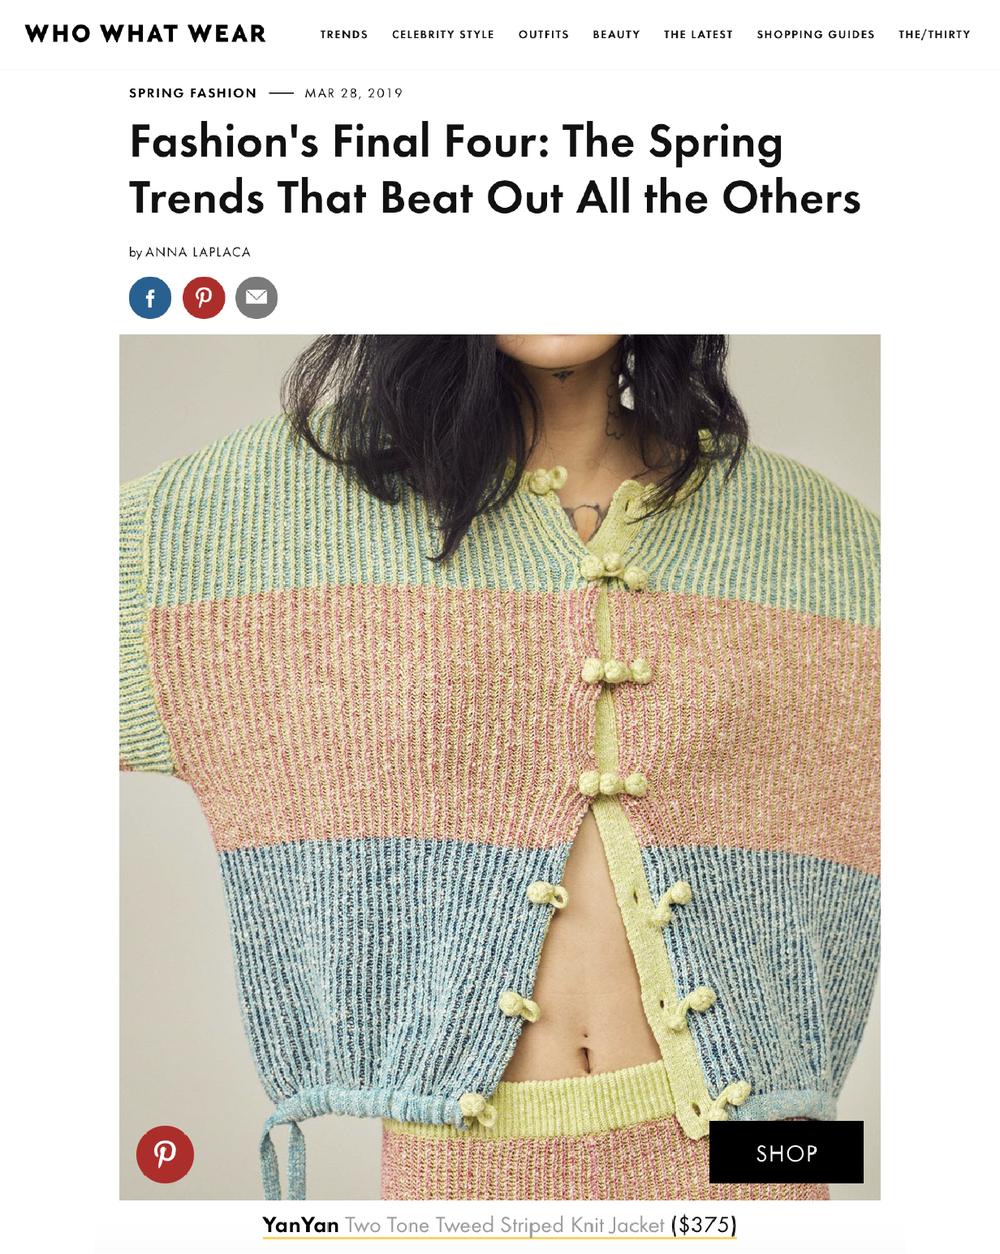 https://www.whowhatwear.com/best-spring-fashion-trends/slide3